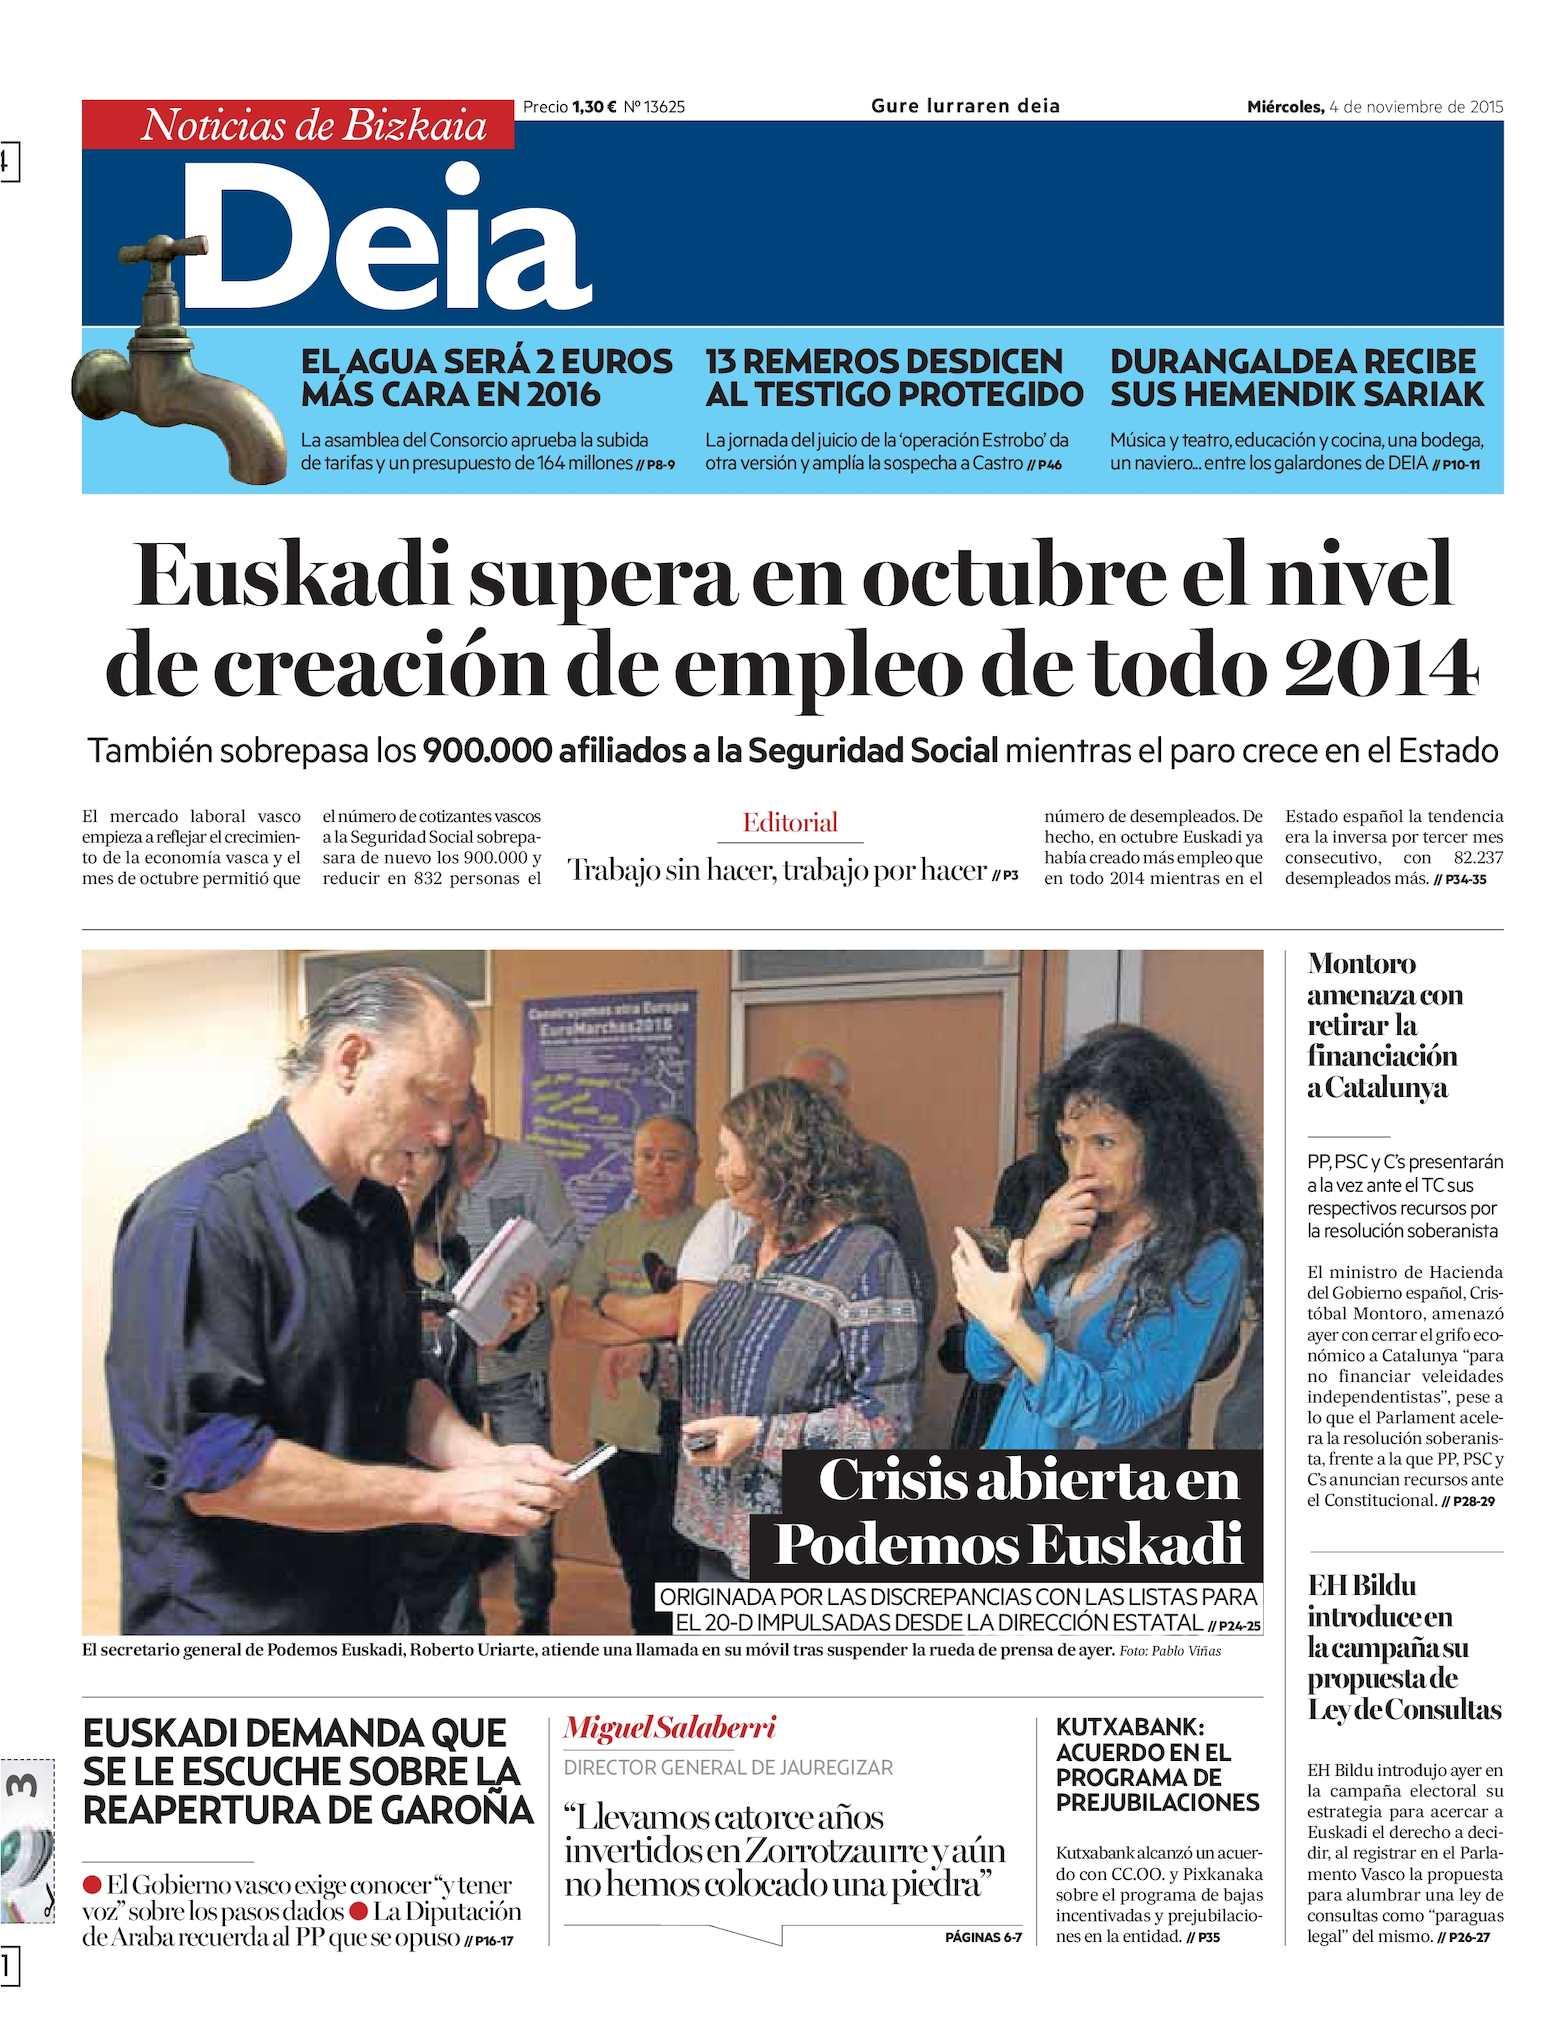 Calaméo - Deia 20151104